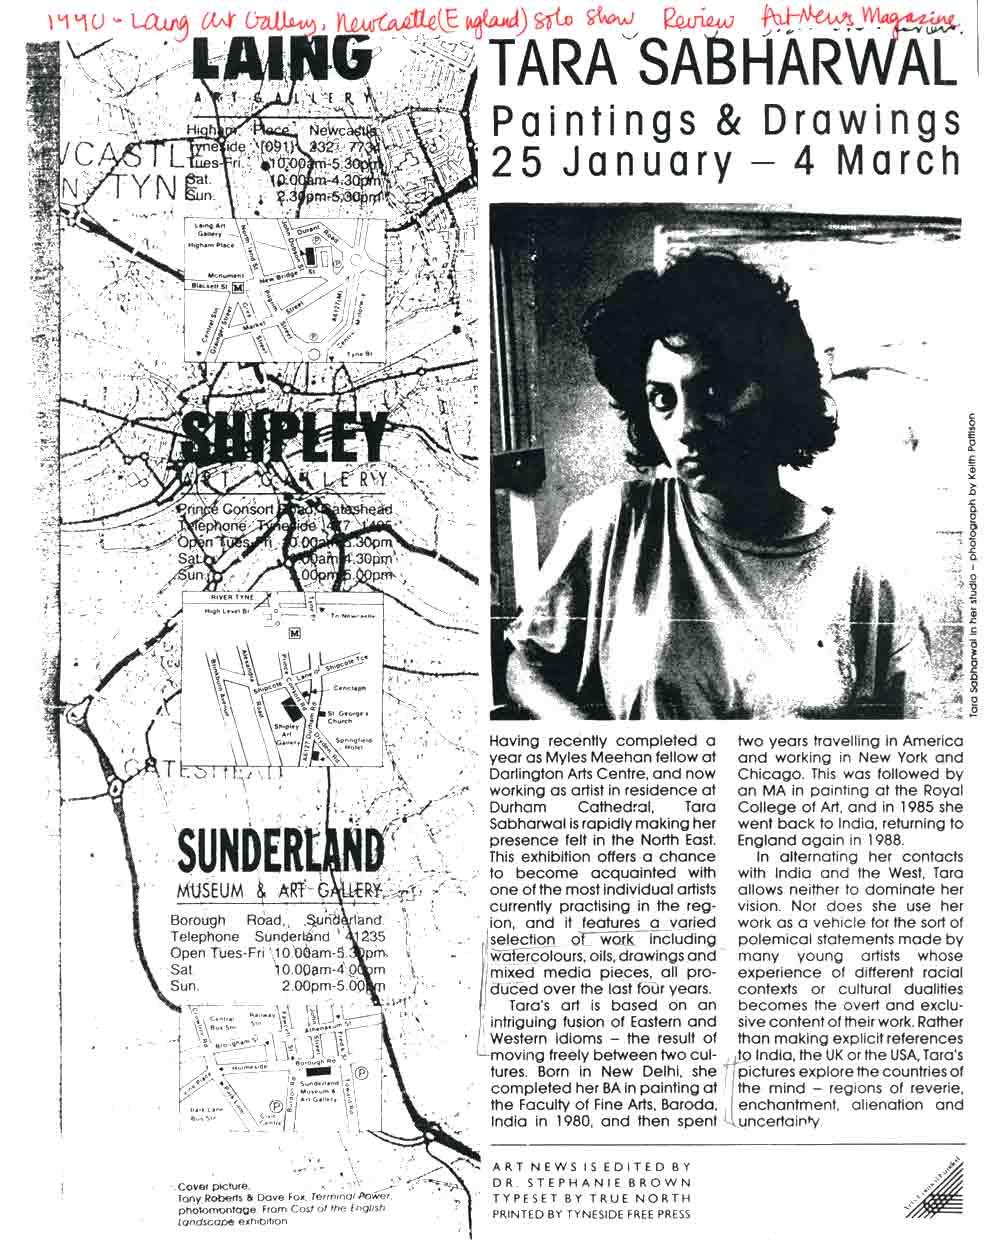 Tara Sabharwal, review, pg 1